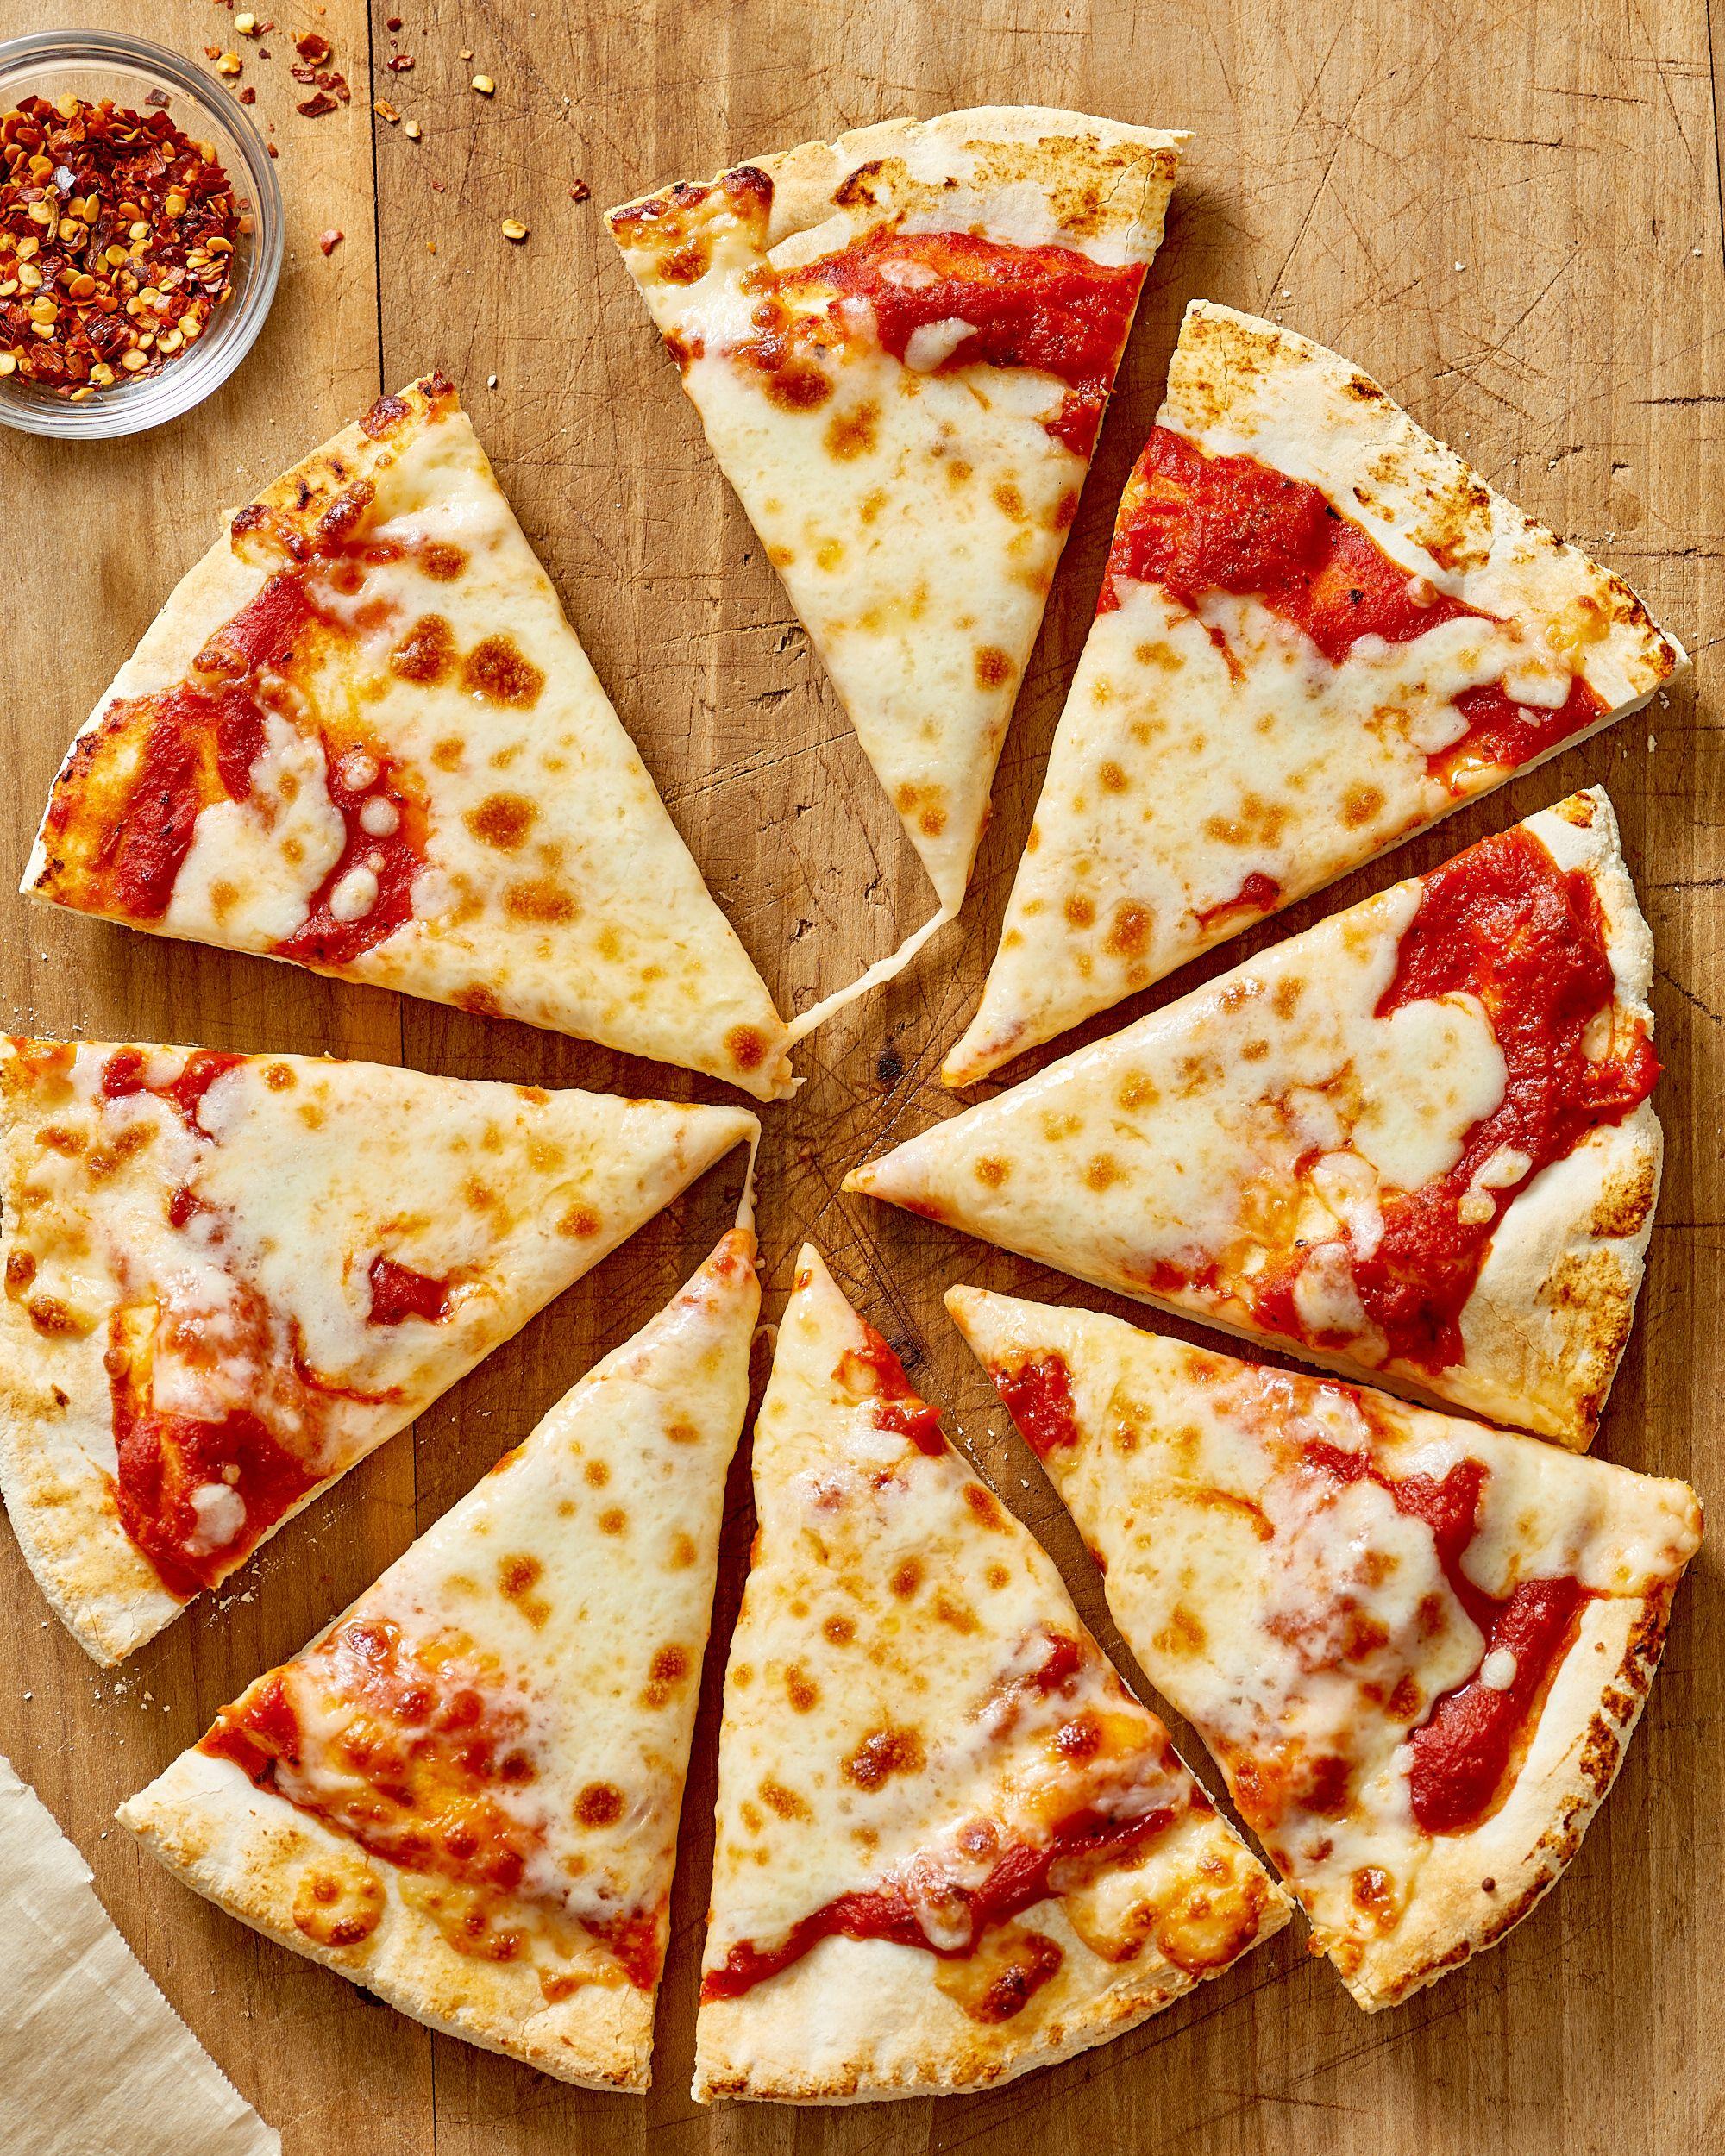 How To Make Gluten Free Pizza Dough Recipe Gluten Free Pizza Dough Gluten Free Pizza Pizza Recipes Dough